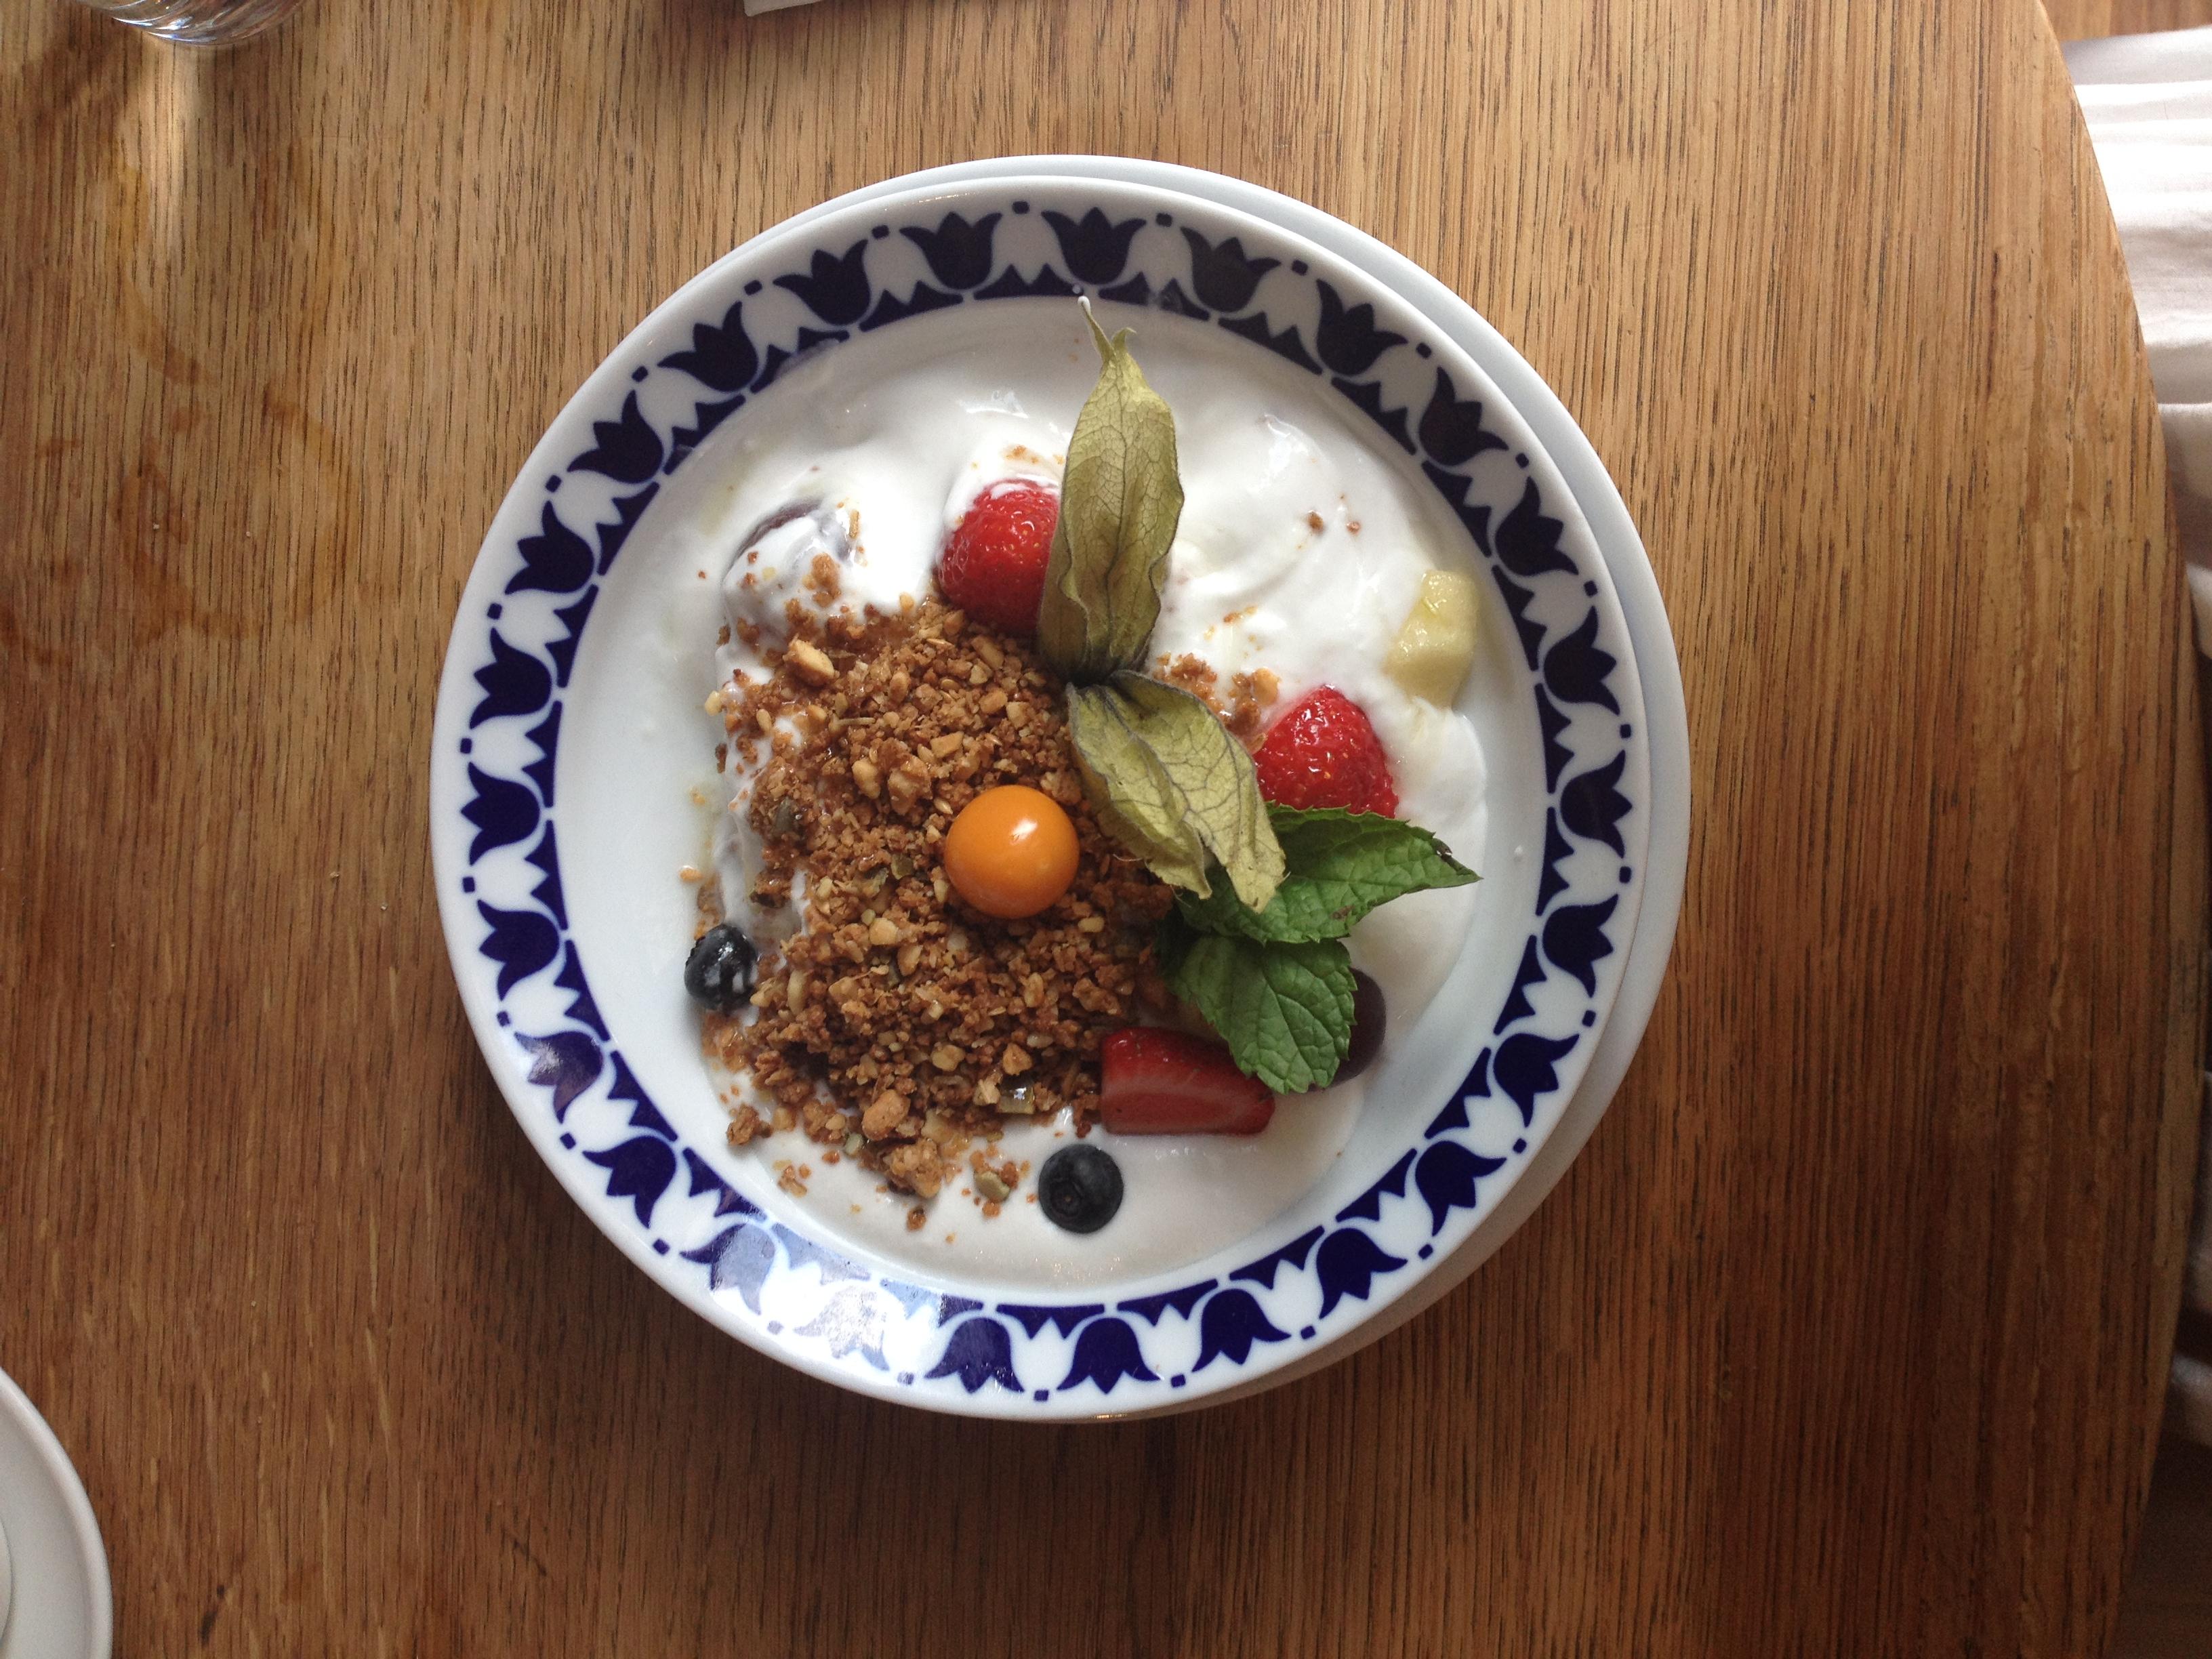 Yogurt - Flax&Kale